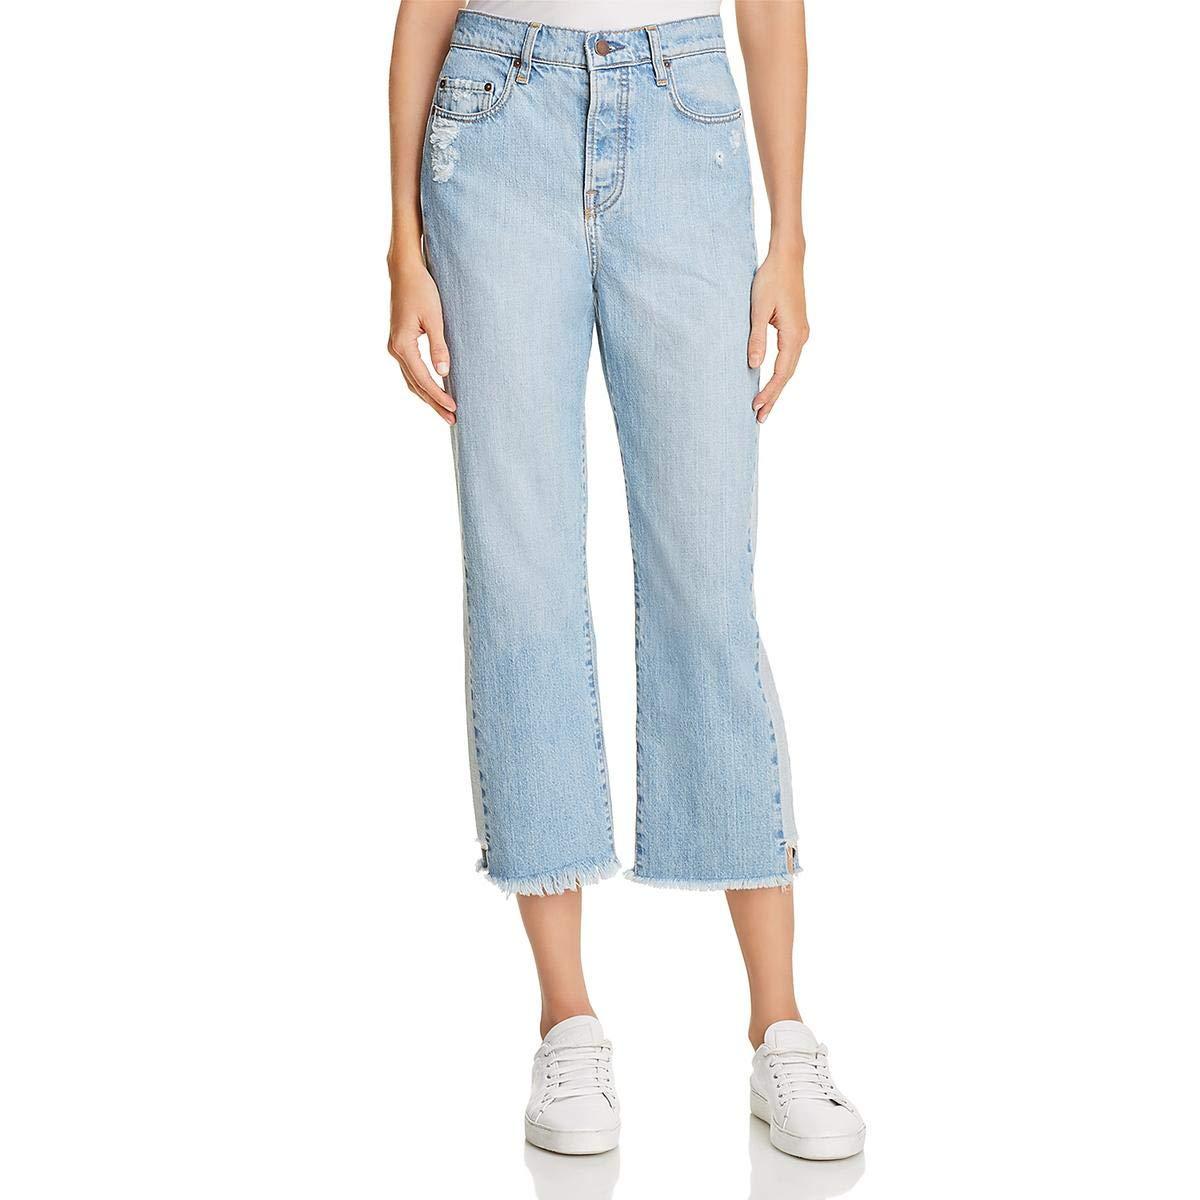 bluee Nobody Womens Straight Tuxedo Ankle Jeans